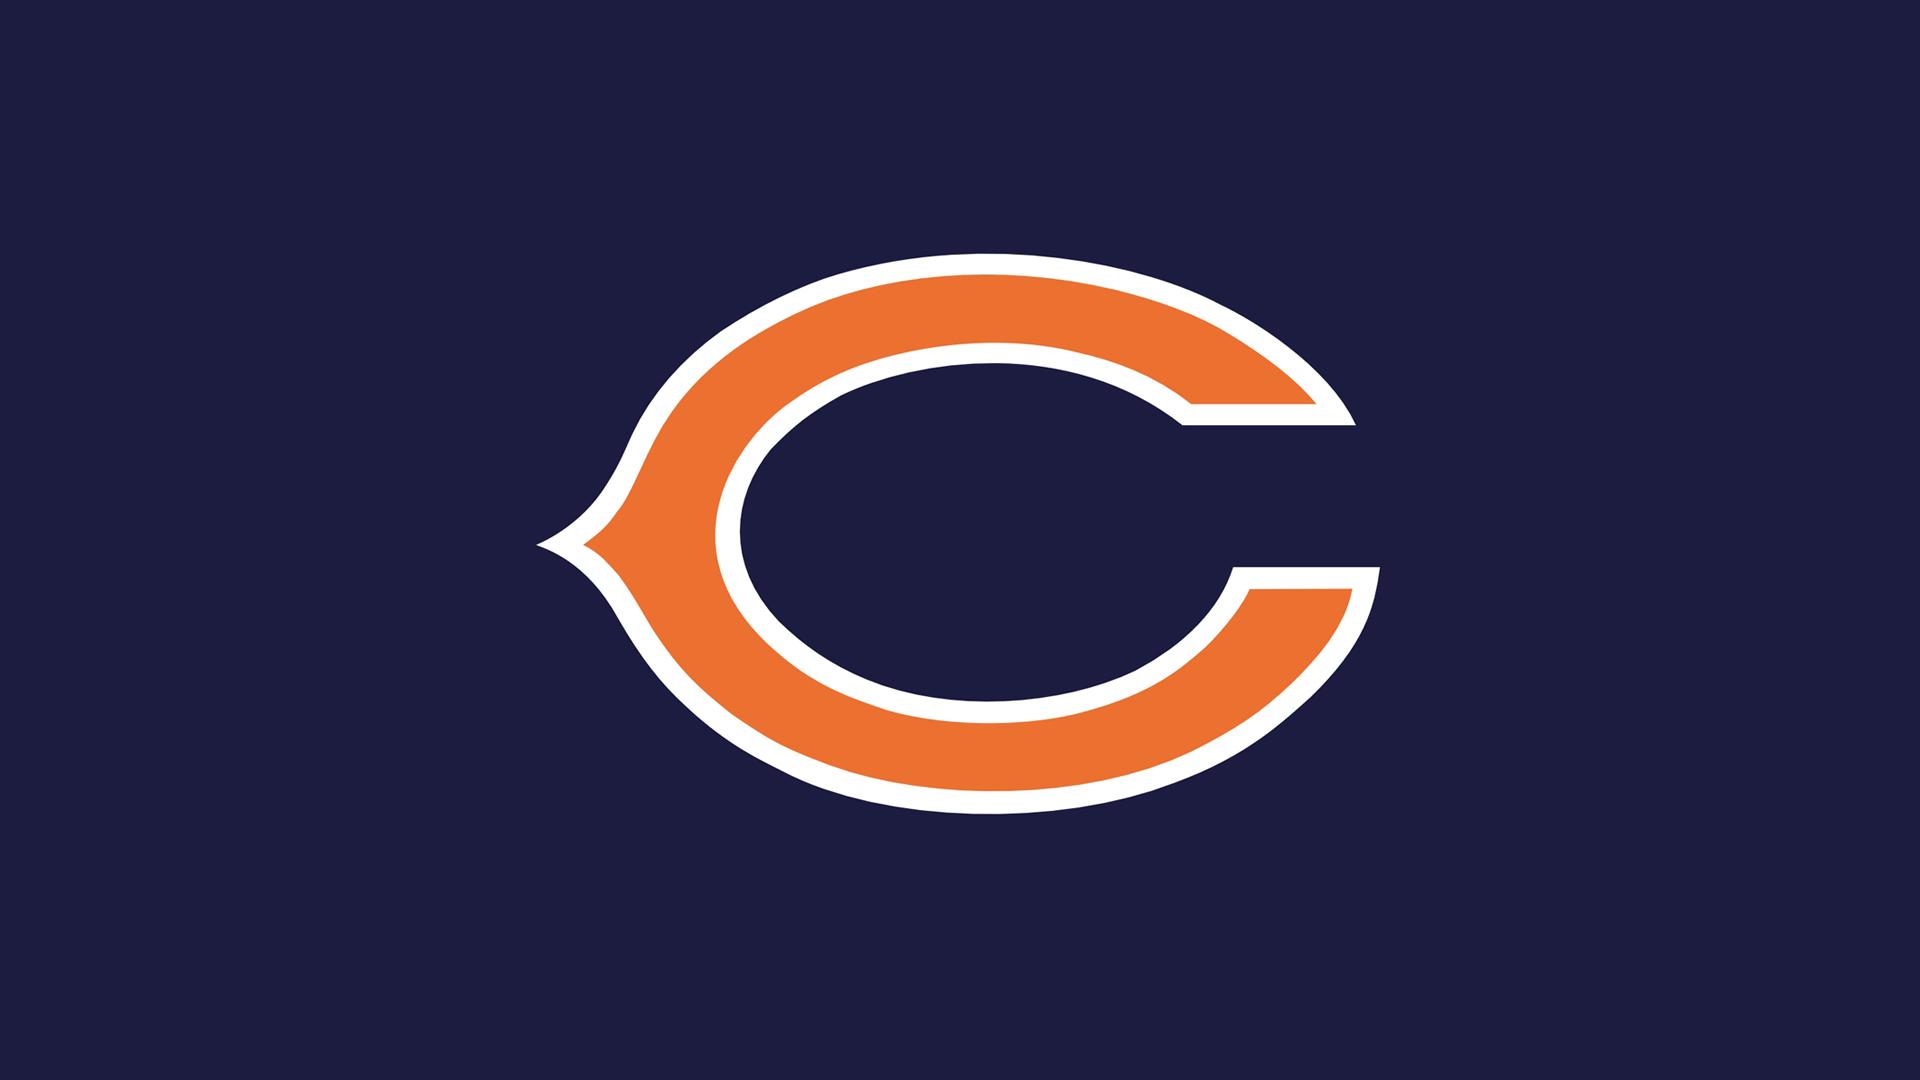 Navy Football Logo Wallpaper Nfl chicago bears c logo dark 1920x1080